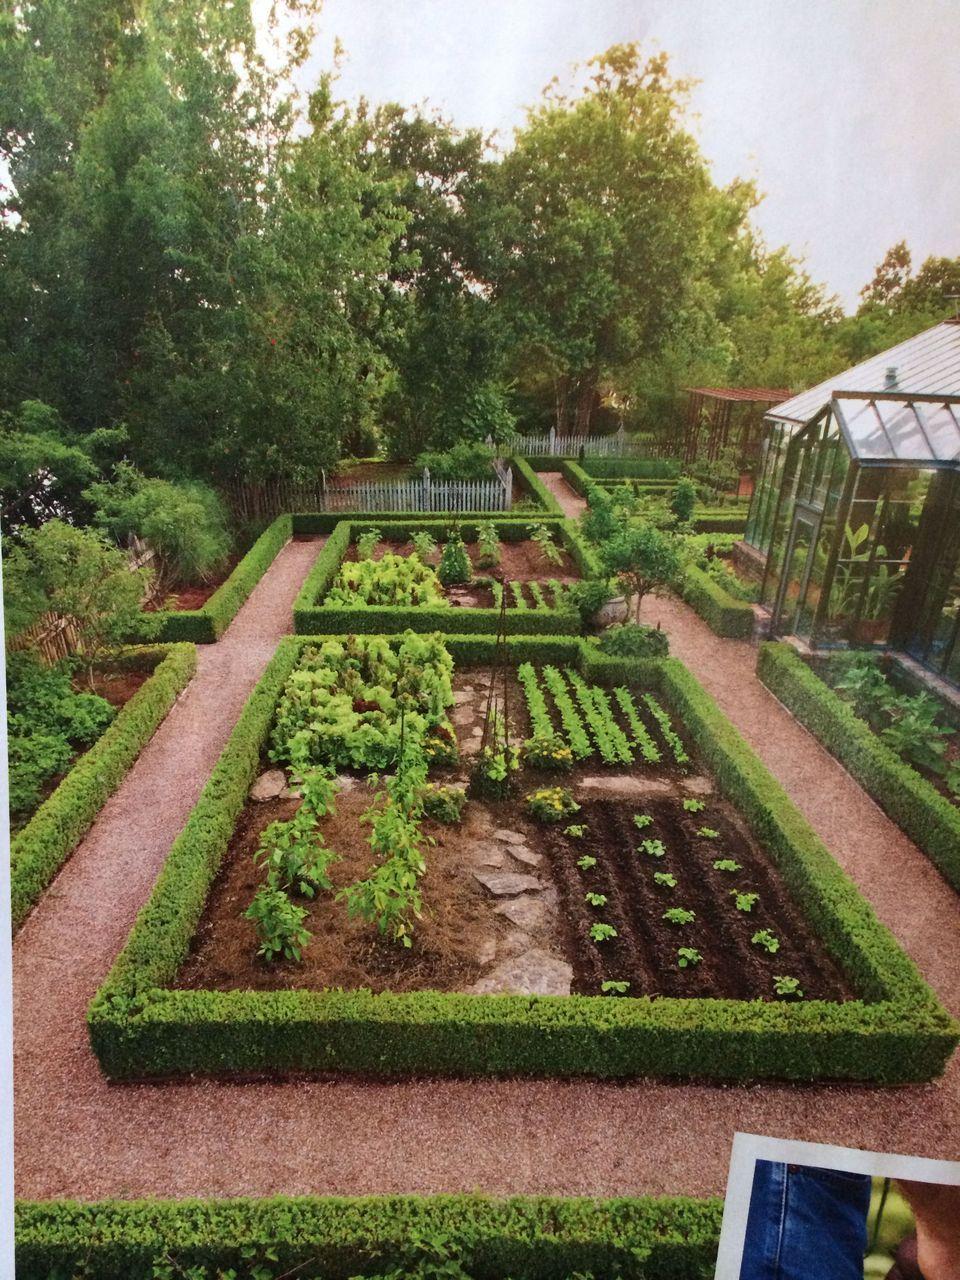 20 Inspiring Homestead Farm Garden Layout and Design Ideas